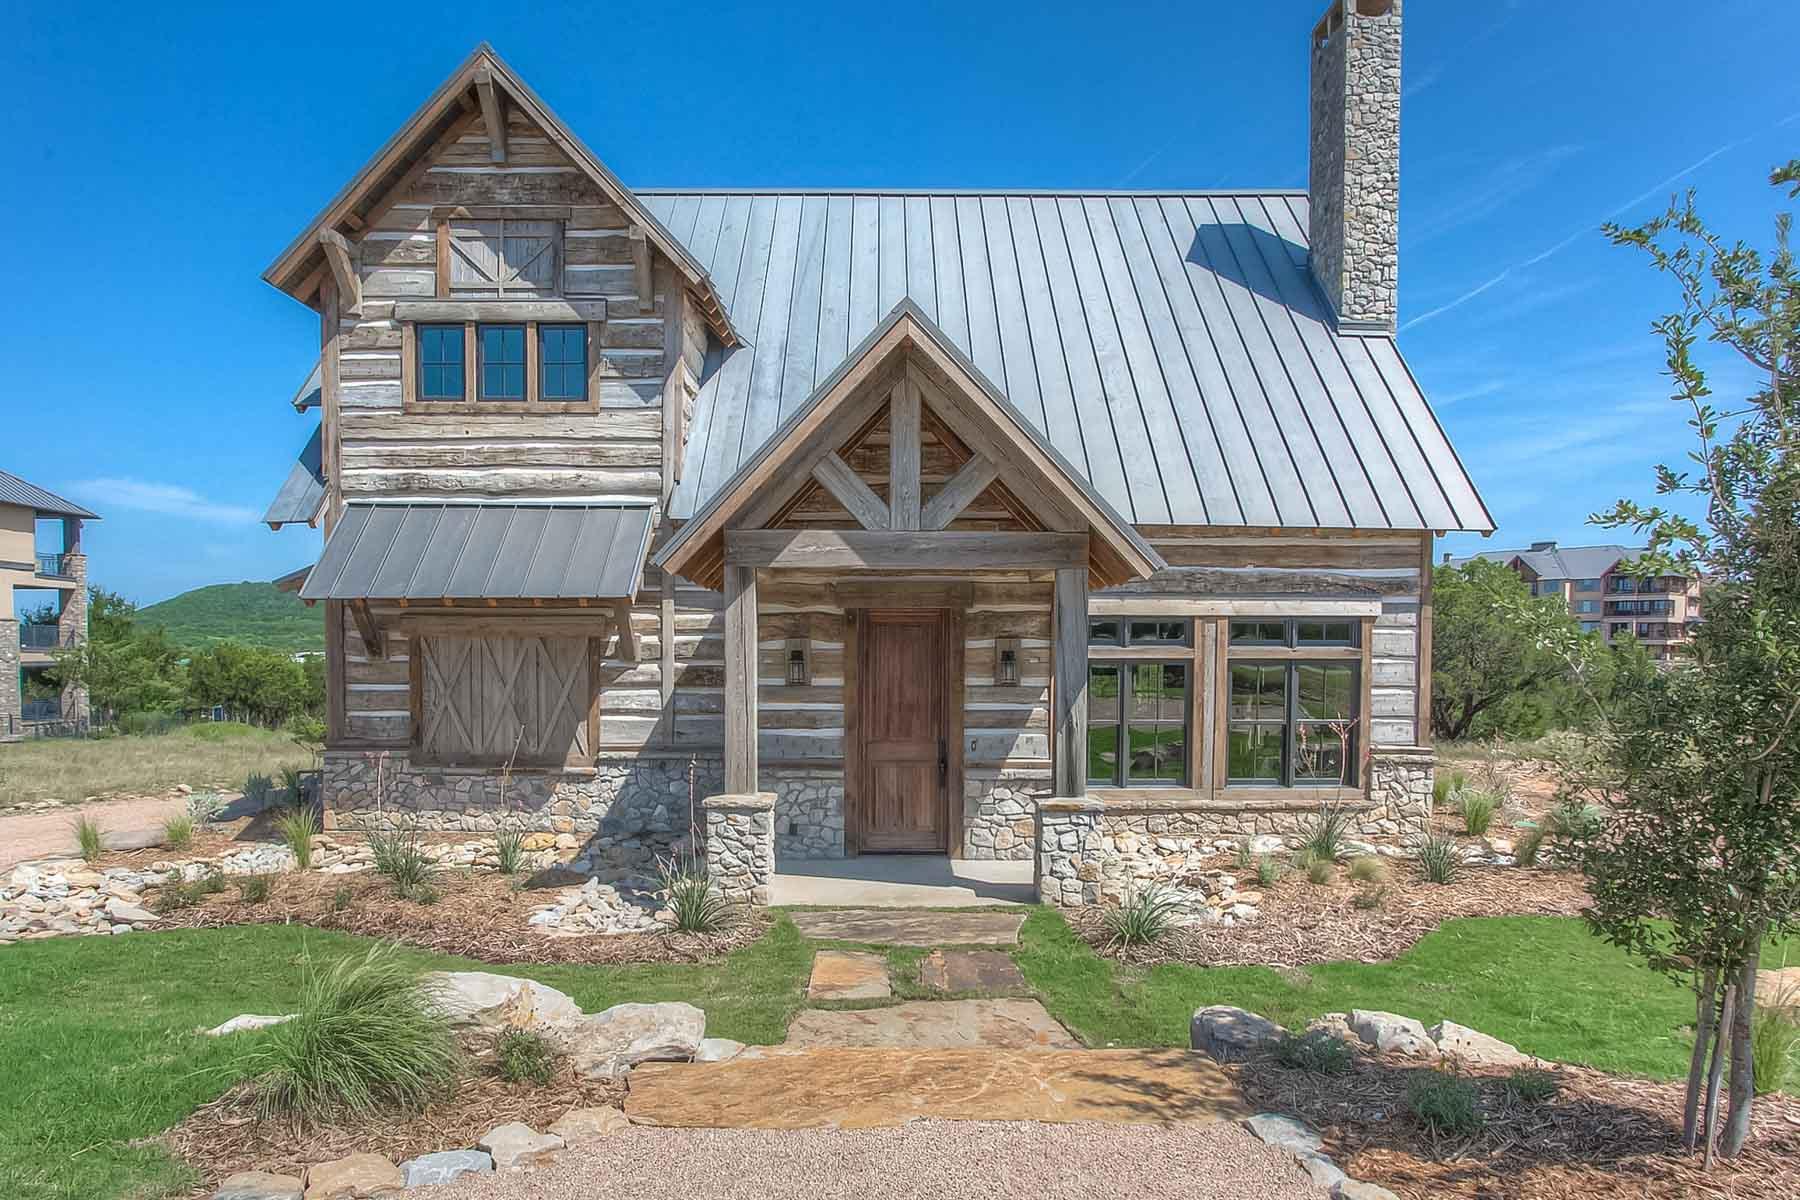 独户住宅 为 销售 在 Ranch Traditional, Vacation Home, Possum Kingdom Lake 2122 Century Oak Drive, #11 福德, 得克萨斯州, 76449 美国